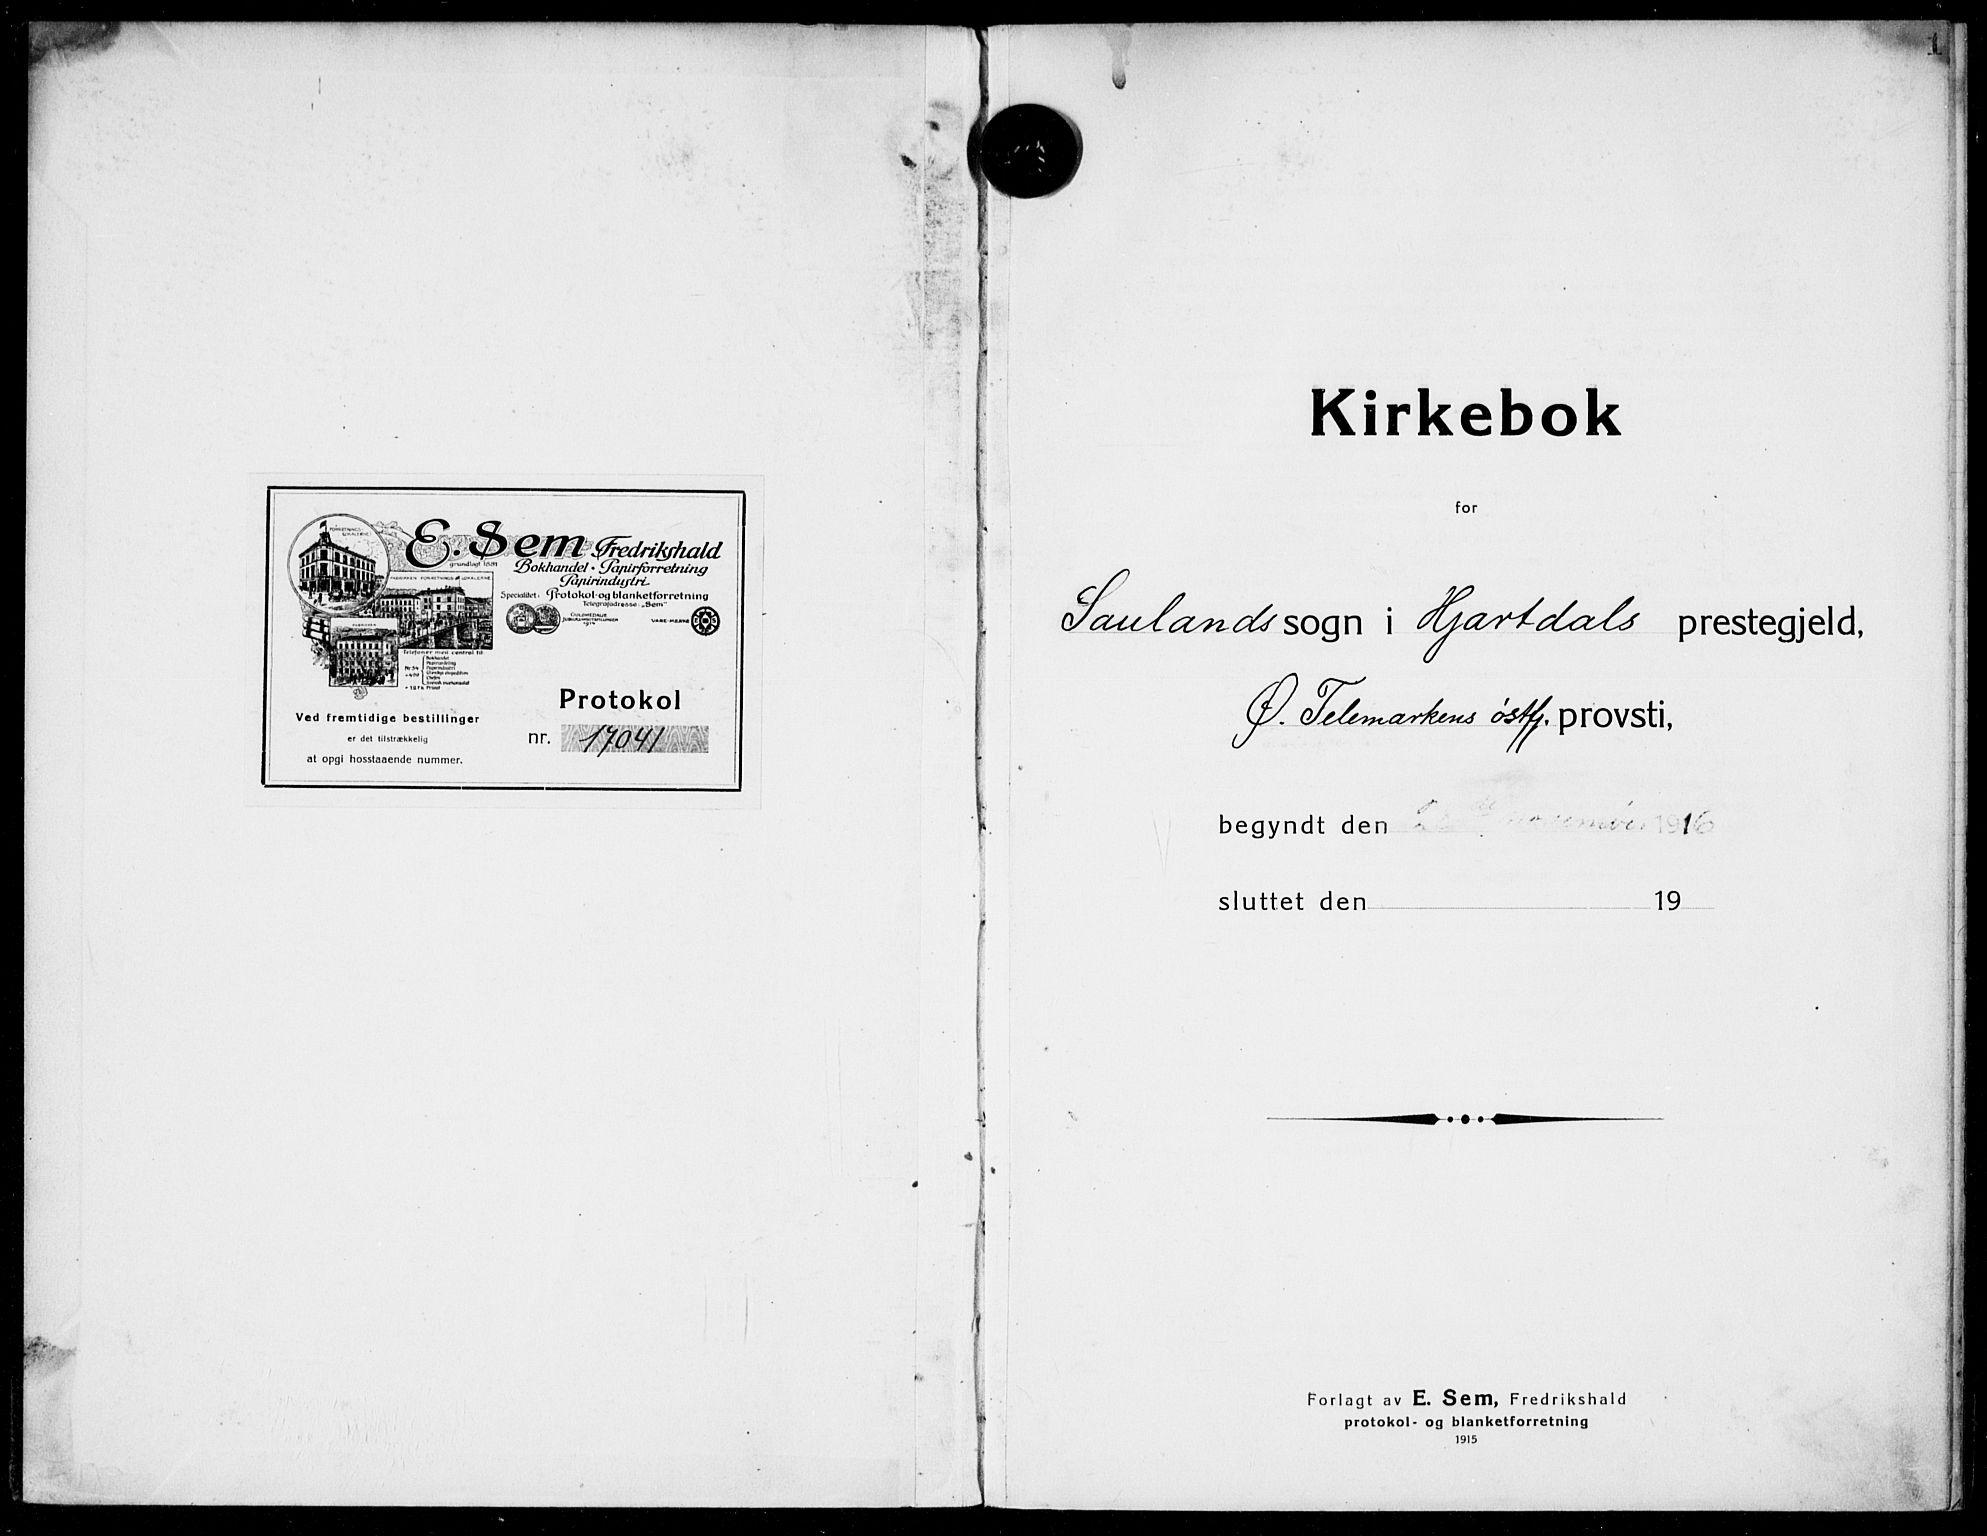 SAKO, Hjartdal kirkebøker, F/Fb/L0003: Ministerialbok nr. II 3, 1920-1932, s. 1